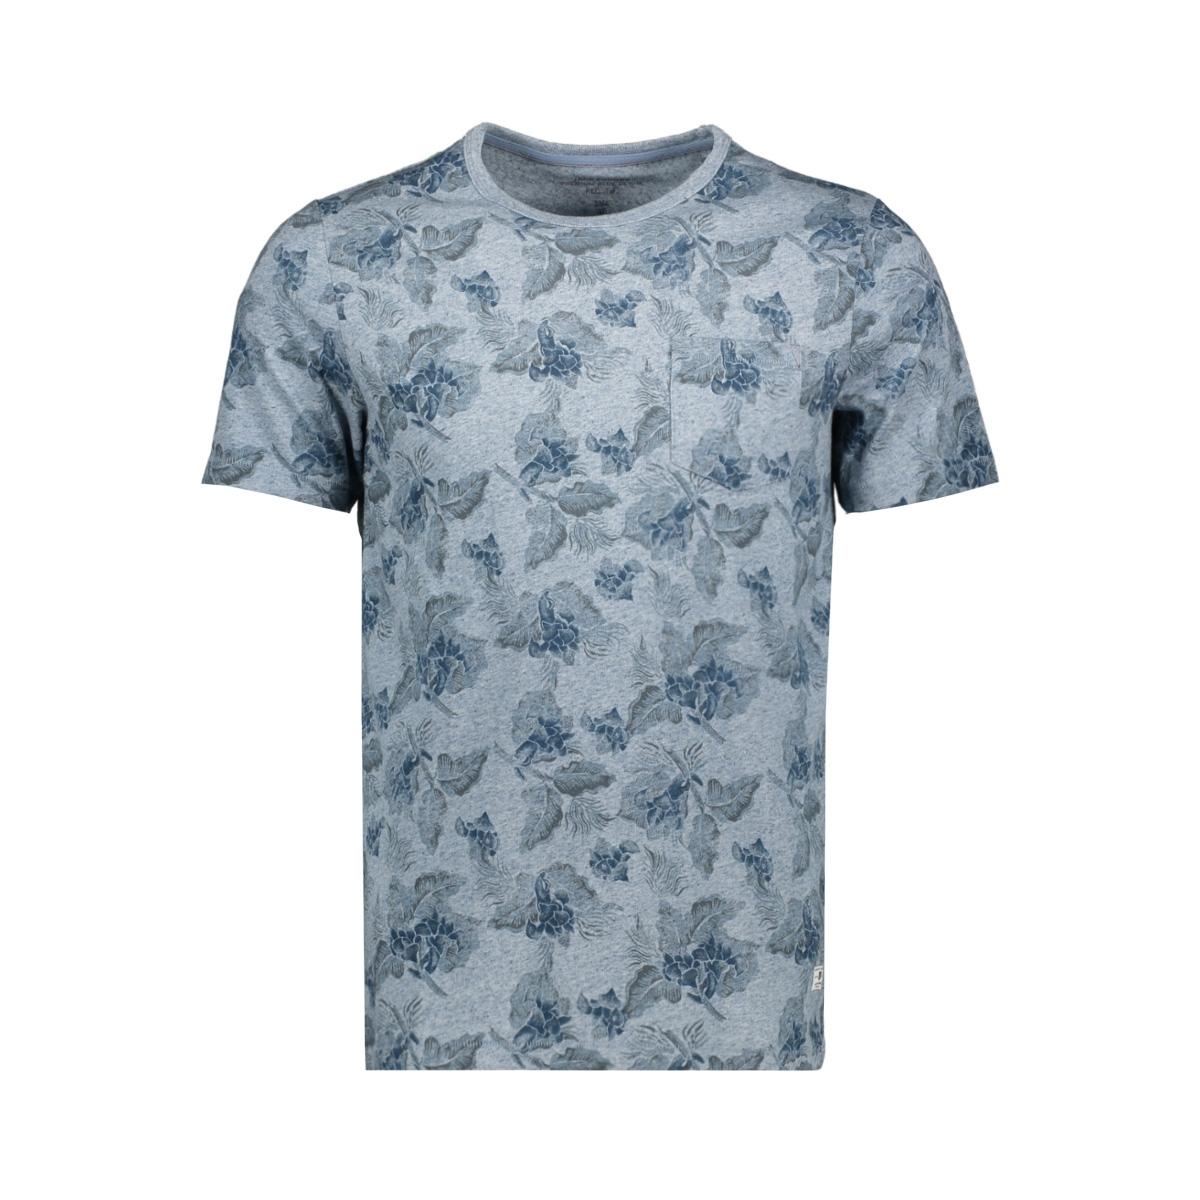 jprjeremy blu. tee ss crew neck 12156368 jack & jones t-shirt faded denim/melange